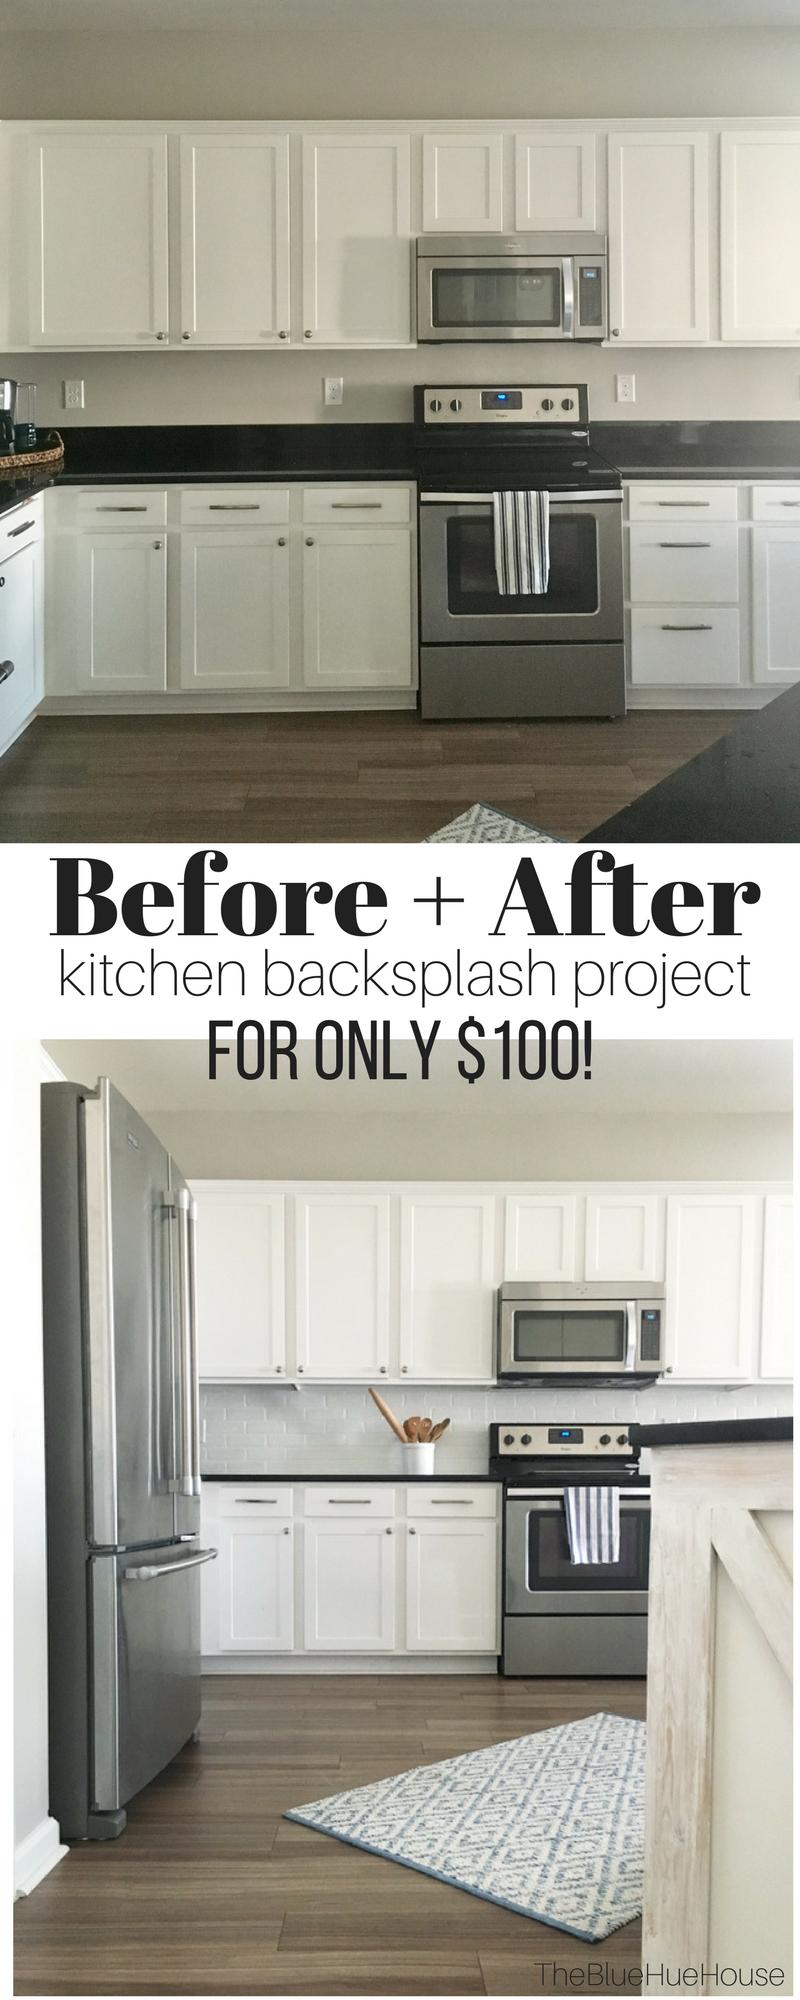 How To Make A Faux Brick Kitchen Backsplash Brick Backsplash